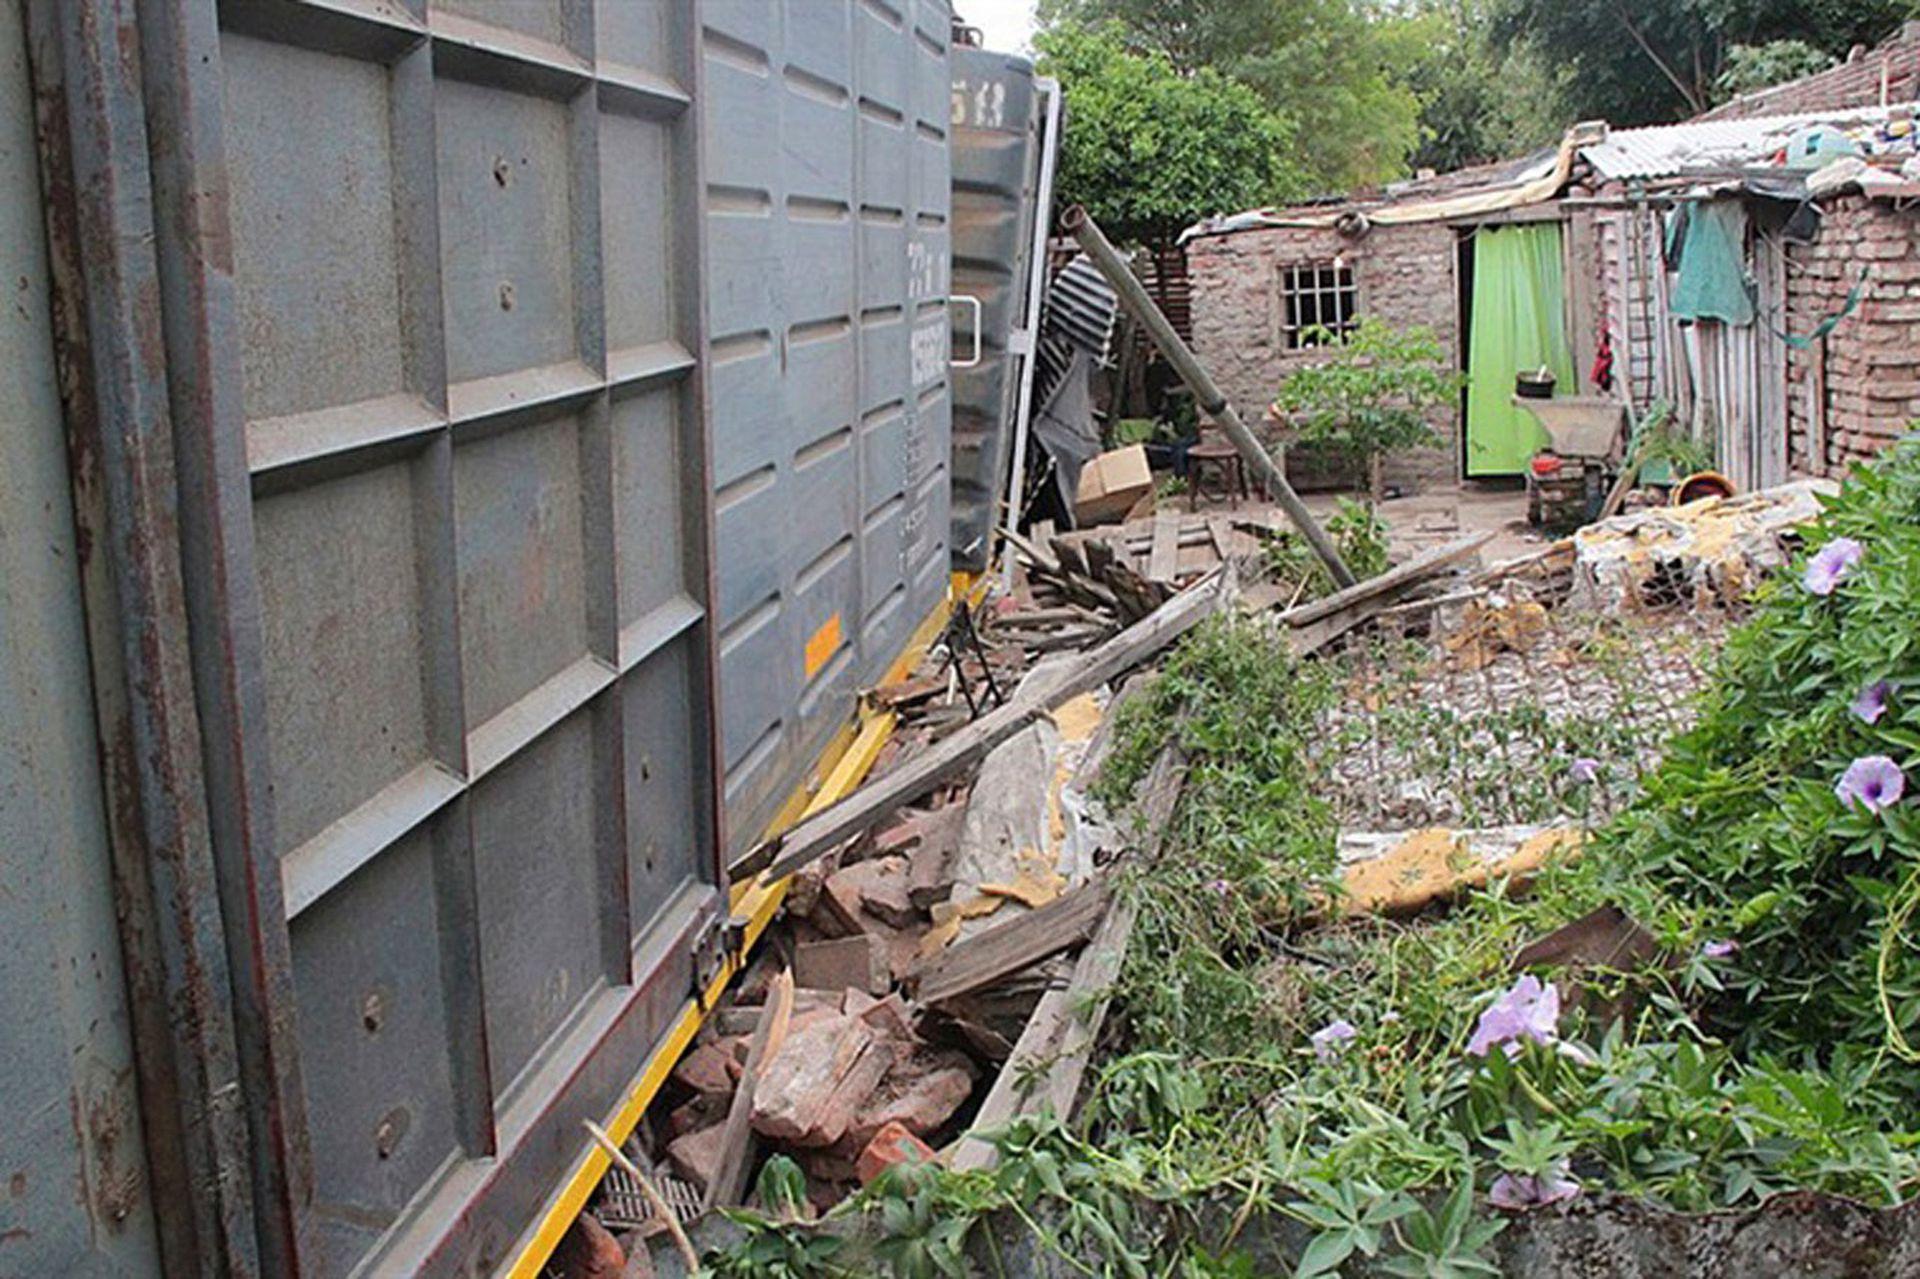 En 2016 un vagón descarriló al pasar por un barrio carenciado de Córdoba y cayó sobre varias casas